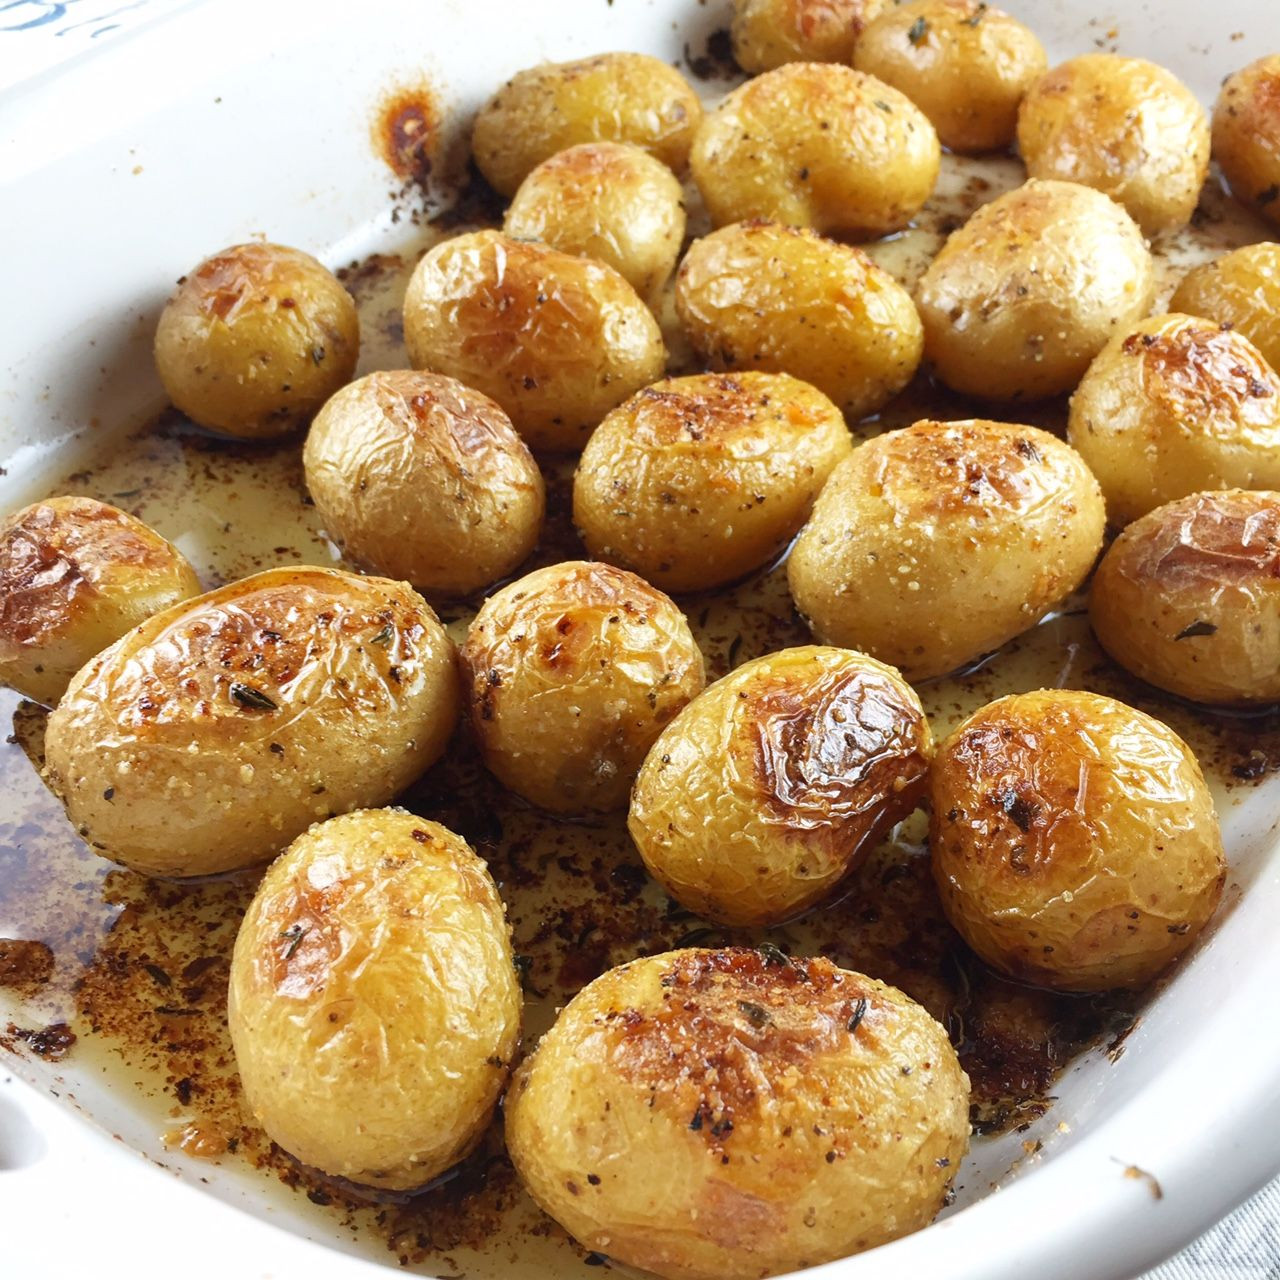 Roasted Gold Potatoes  Roasted Honey Gold Potatoes Food & Recipes